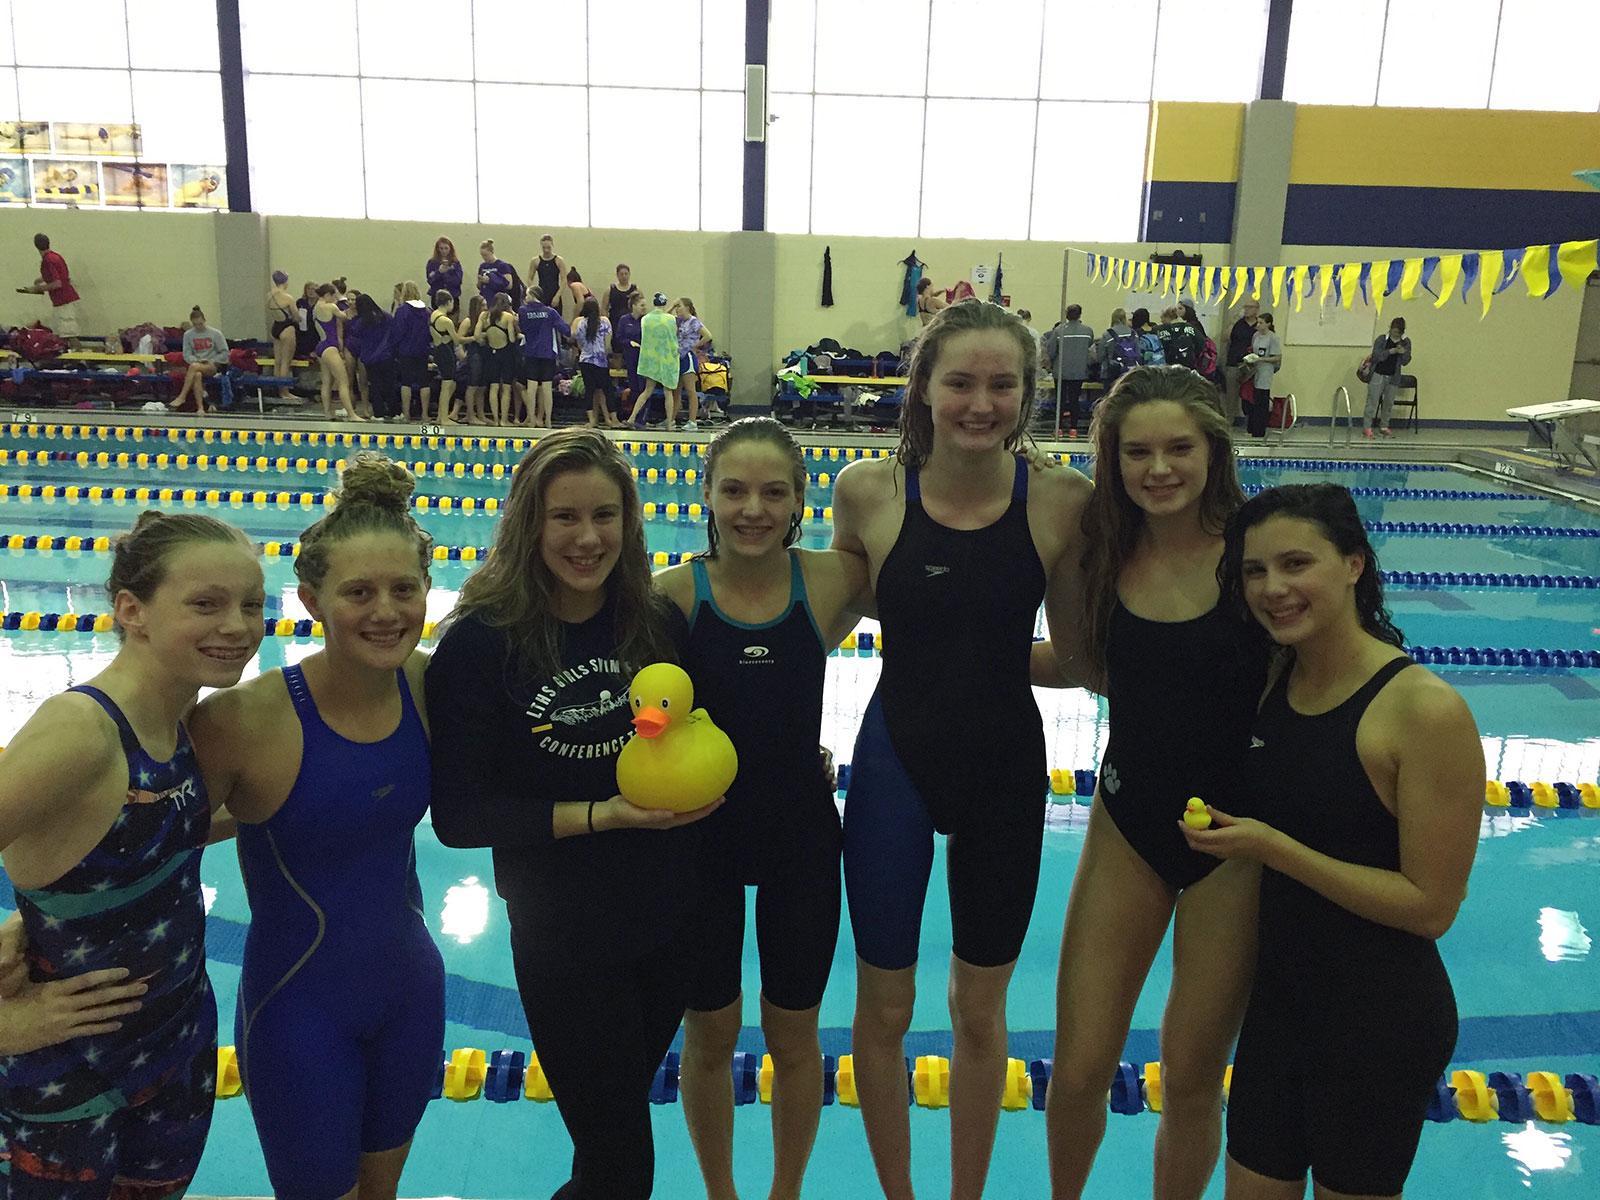 Wimmer stands center holding a rubber duck amongst fellow varsity teammates